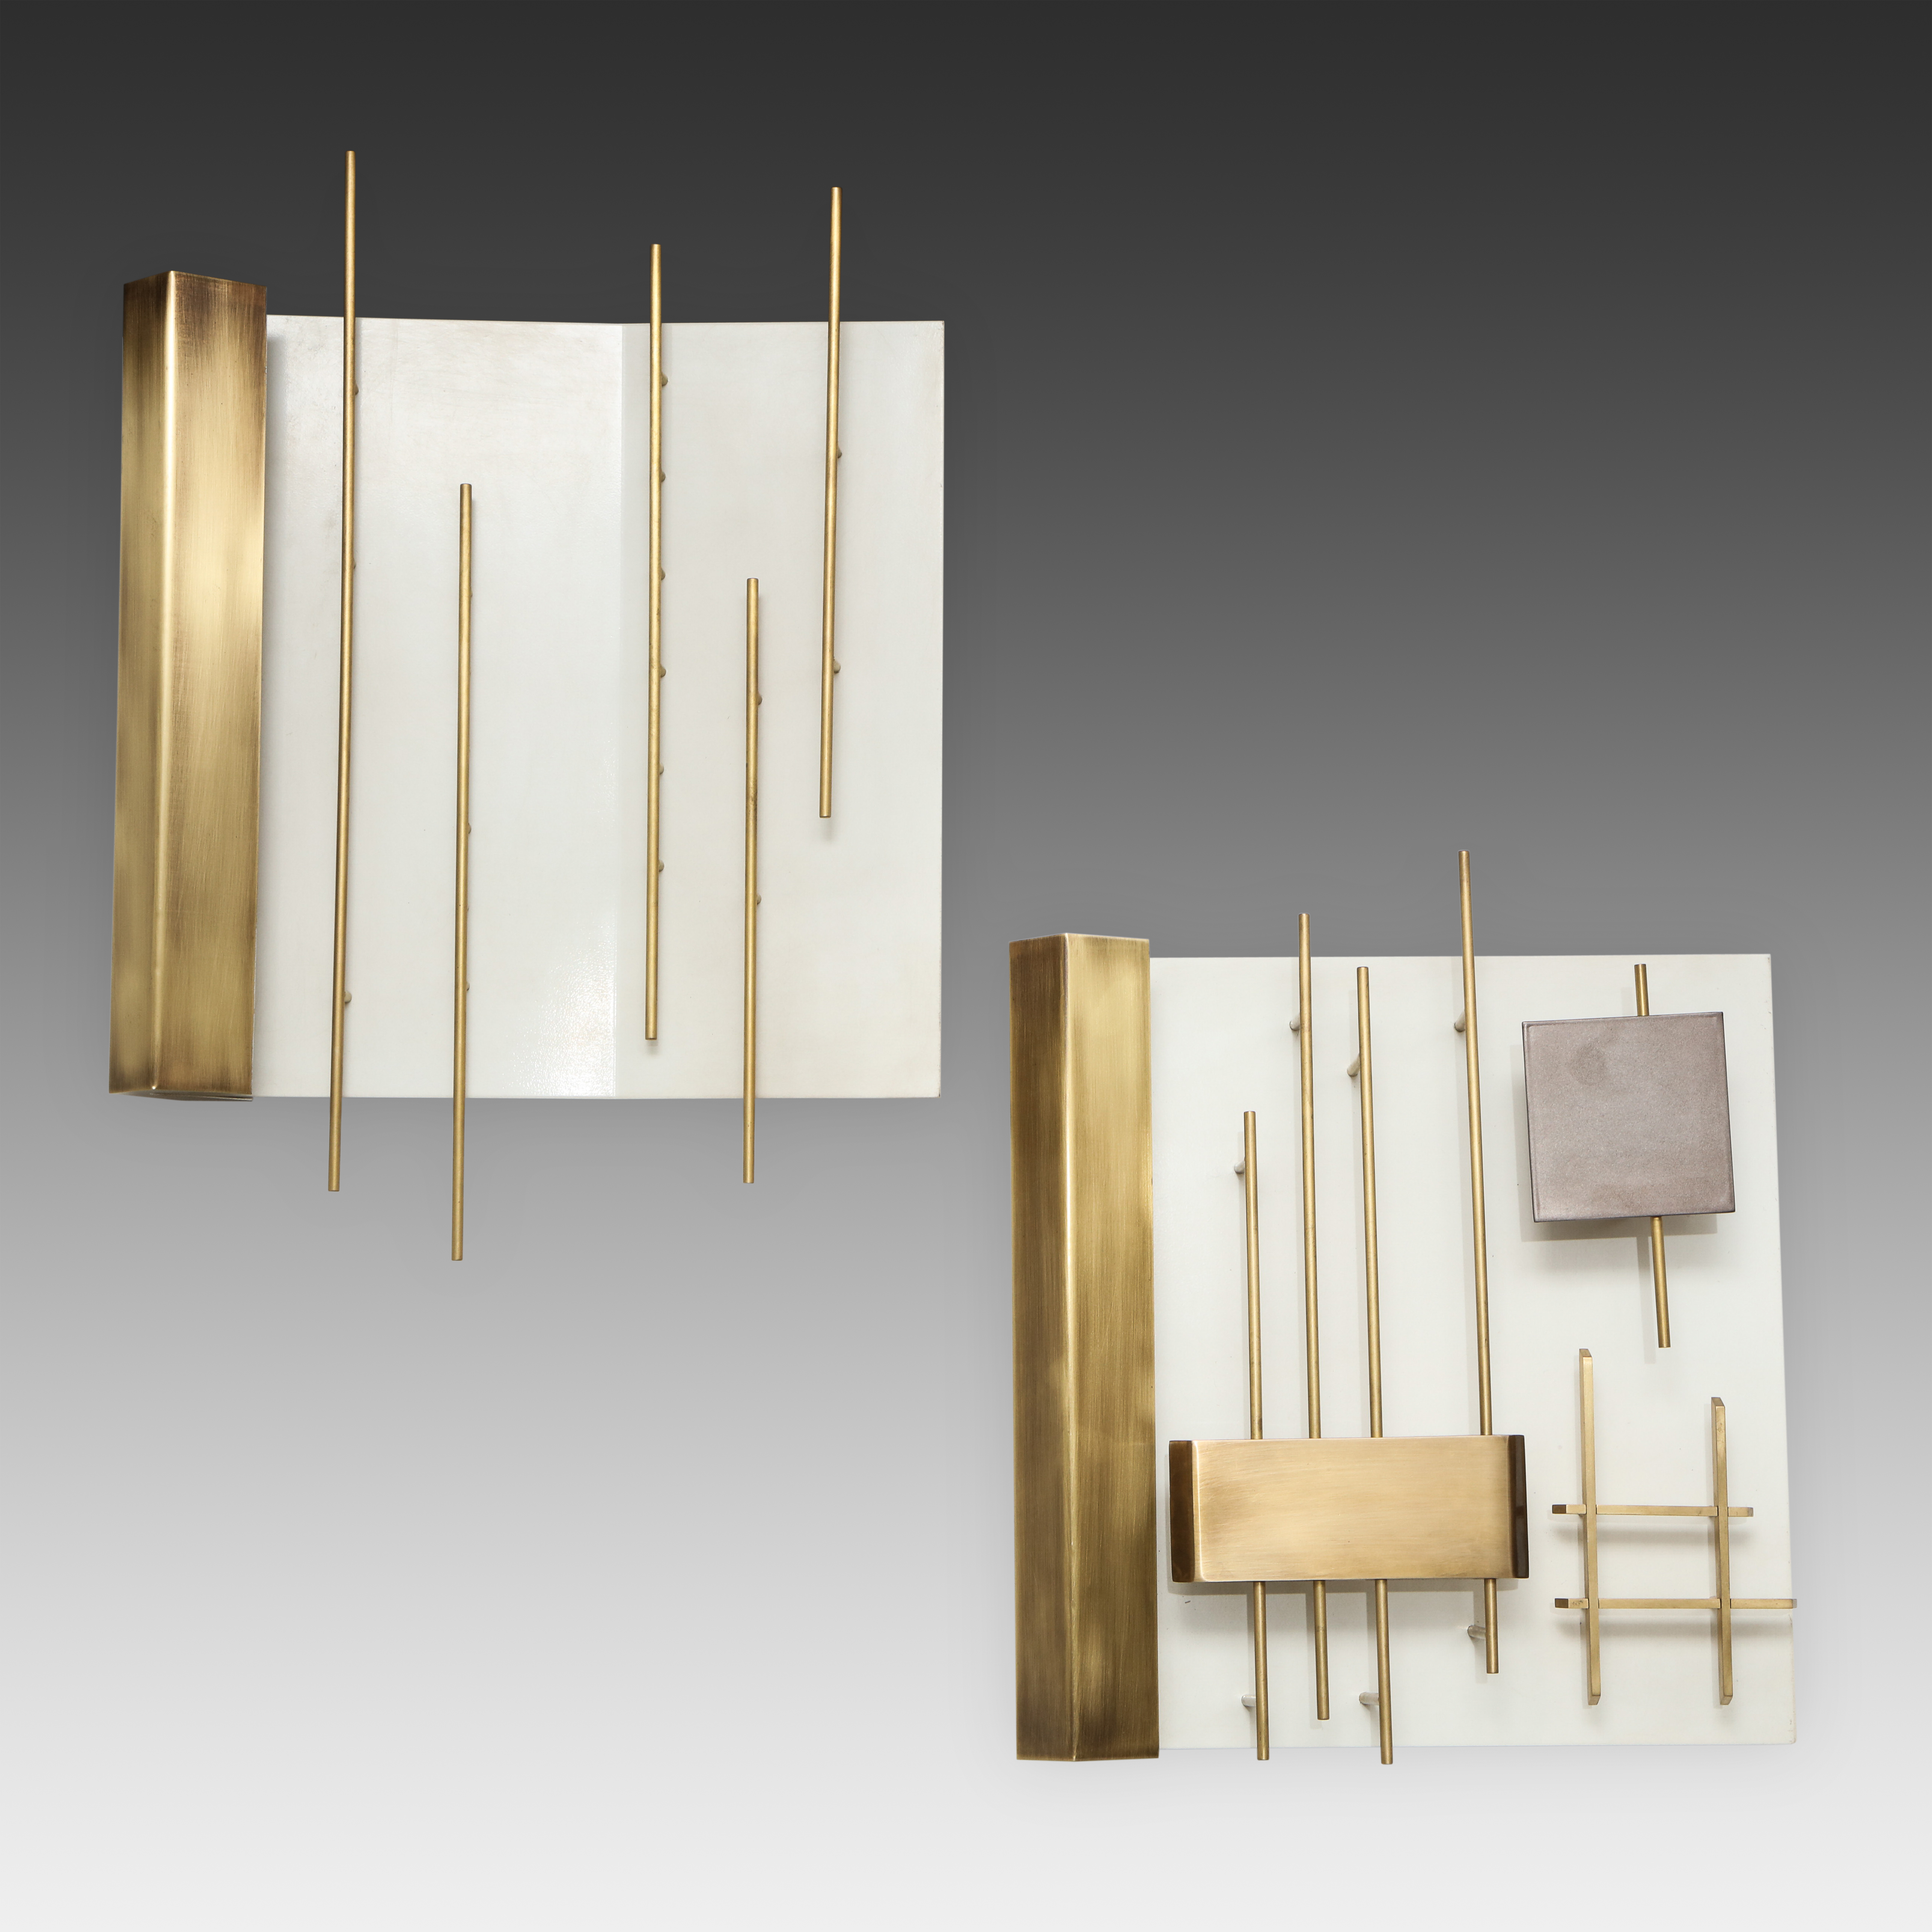 Pair of 'Quadri Luminosi' Sconces Models 575 & 576 by Gio Ponti for Lumi   soyun k.